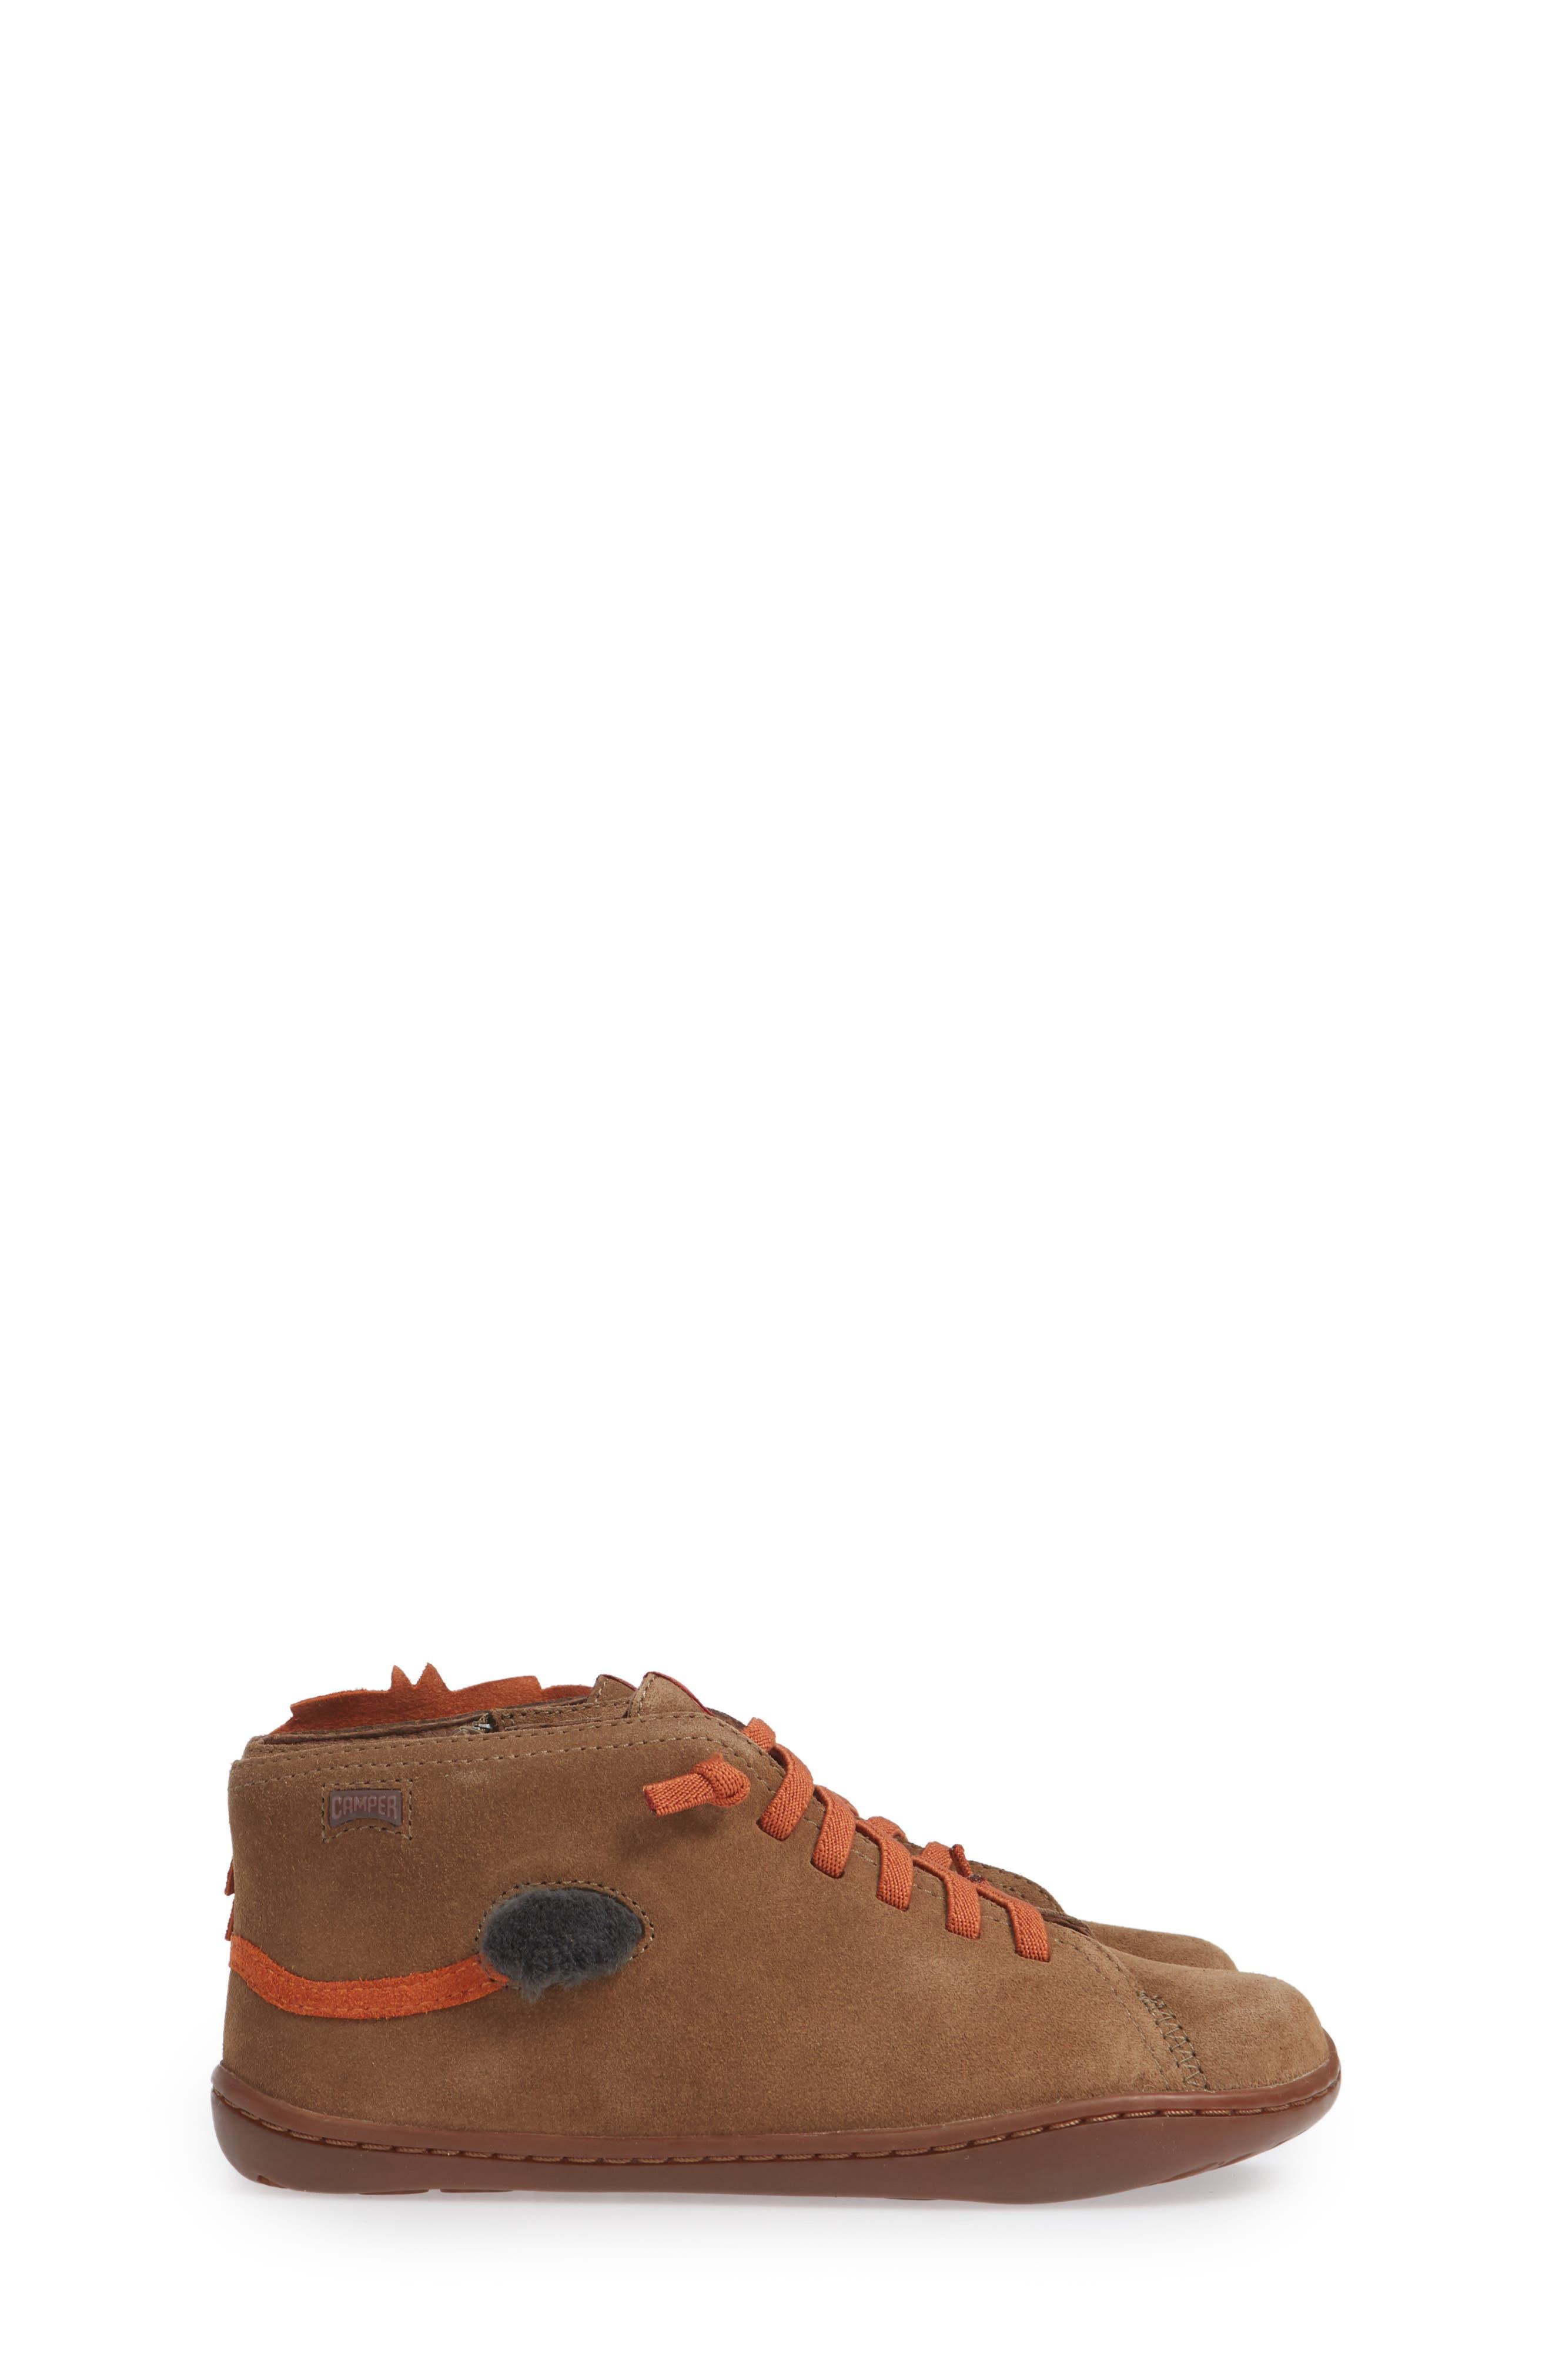 TWS Boot,                             Alternate thumbnail 4, color,                             MEDIUM BROWN